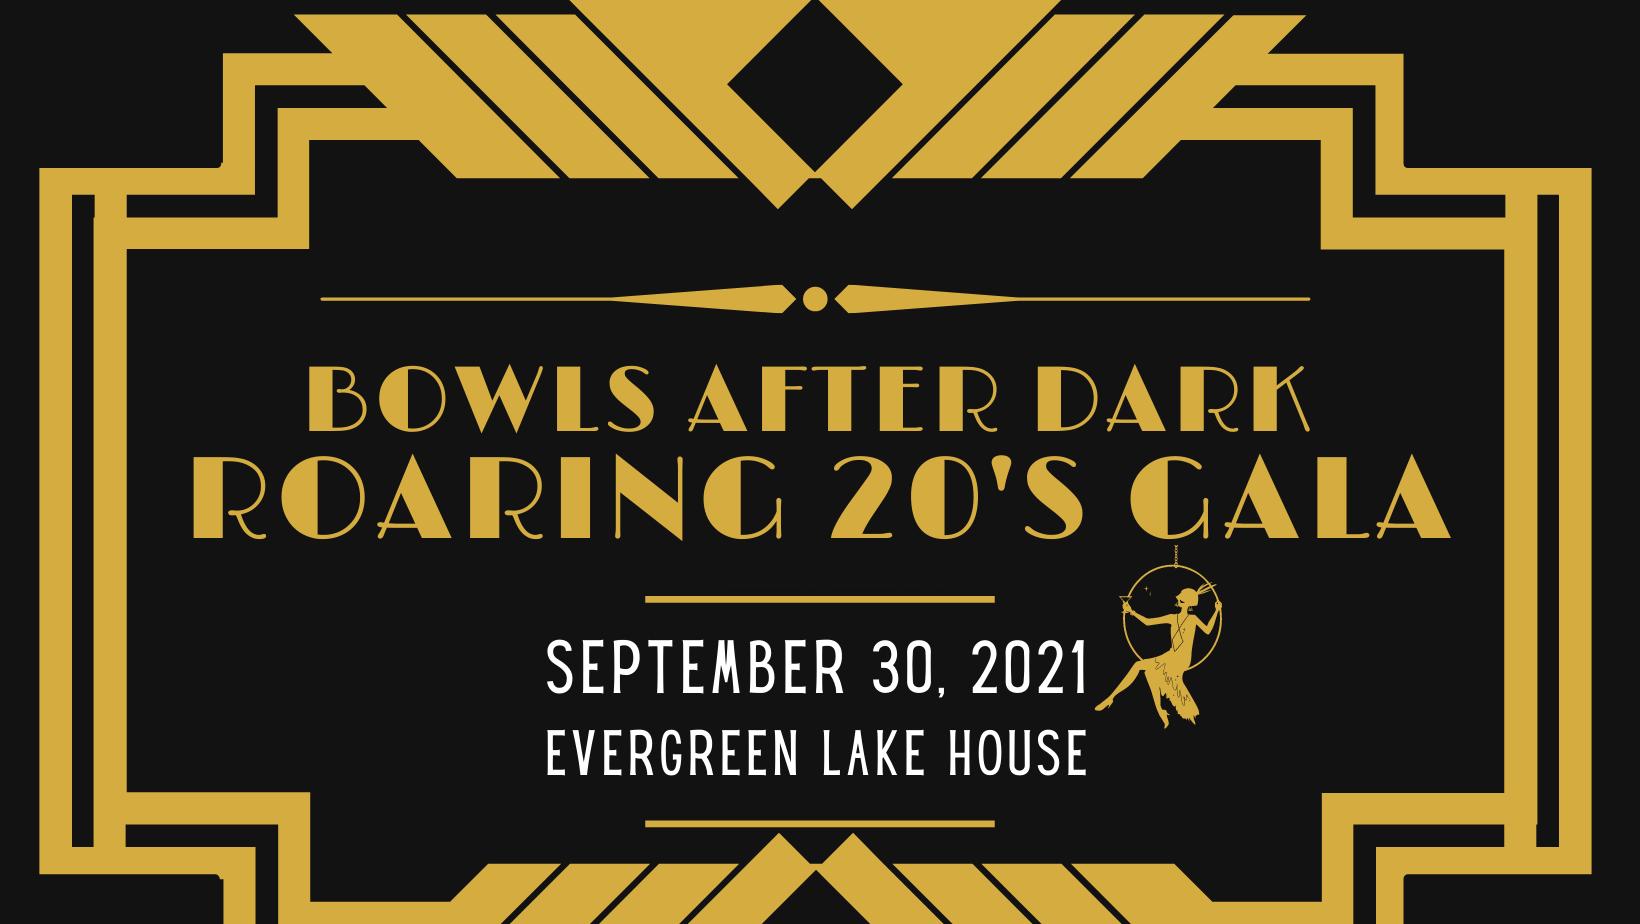 Bowls After Dark Evening Gala image